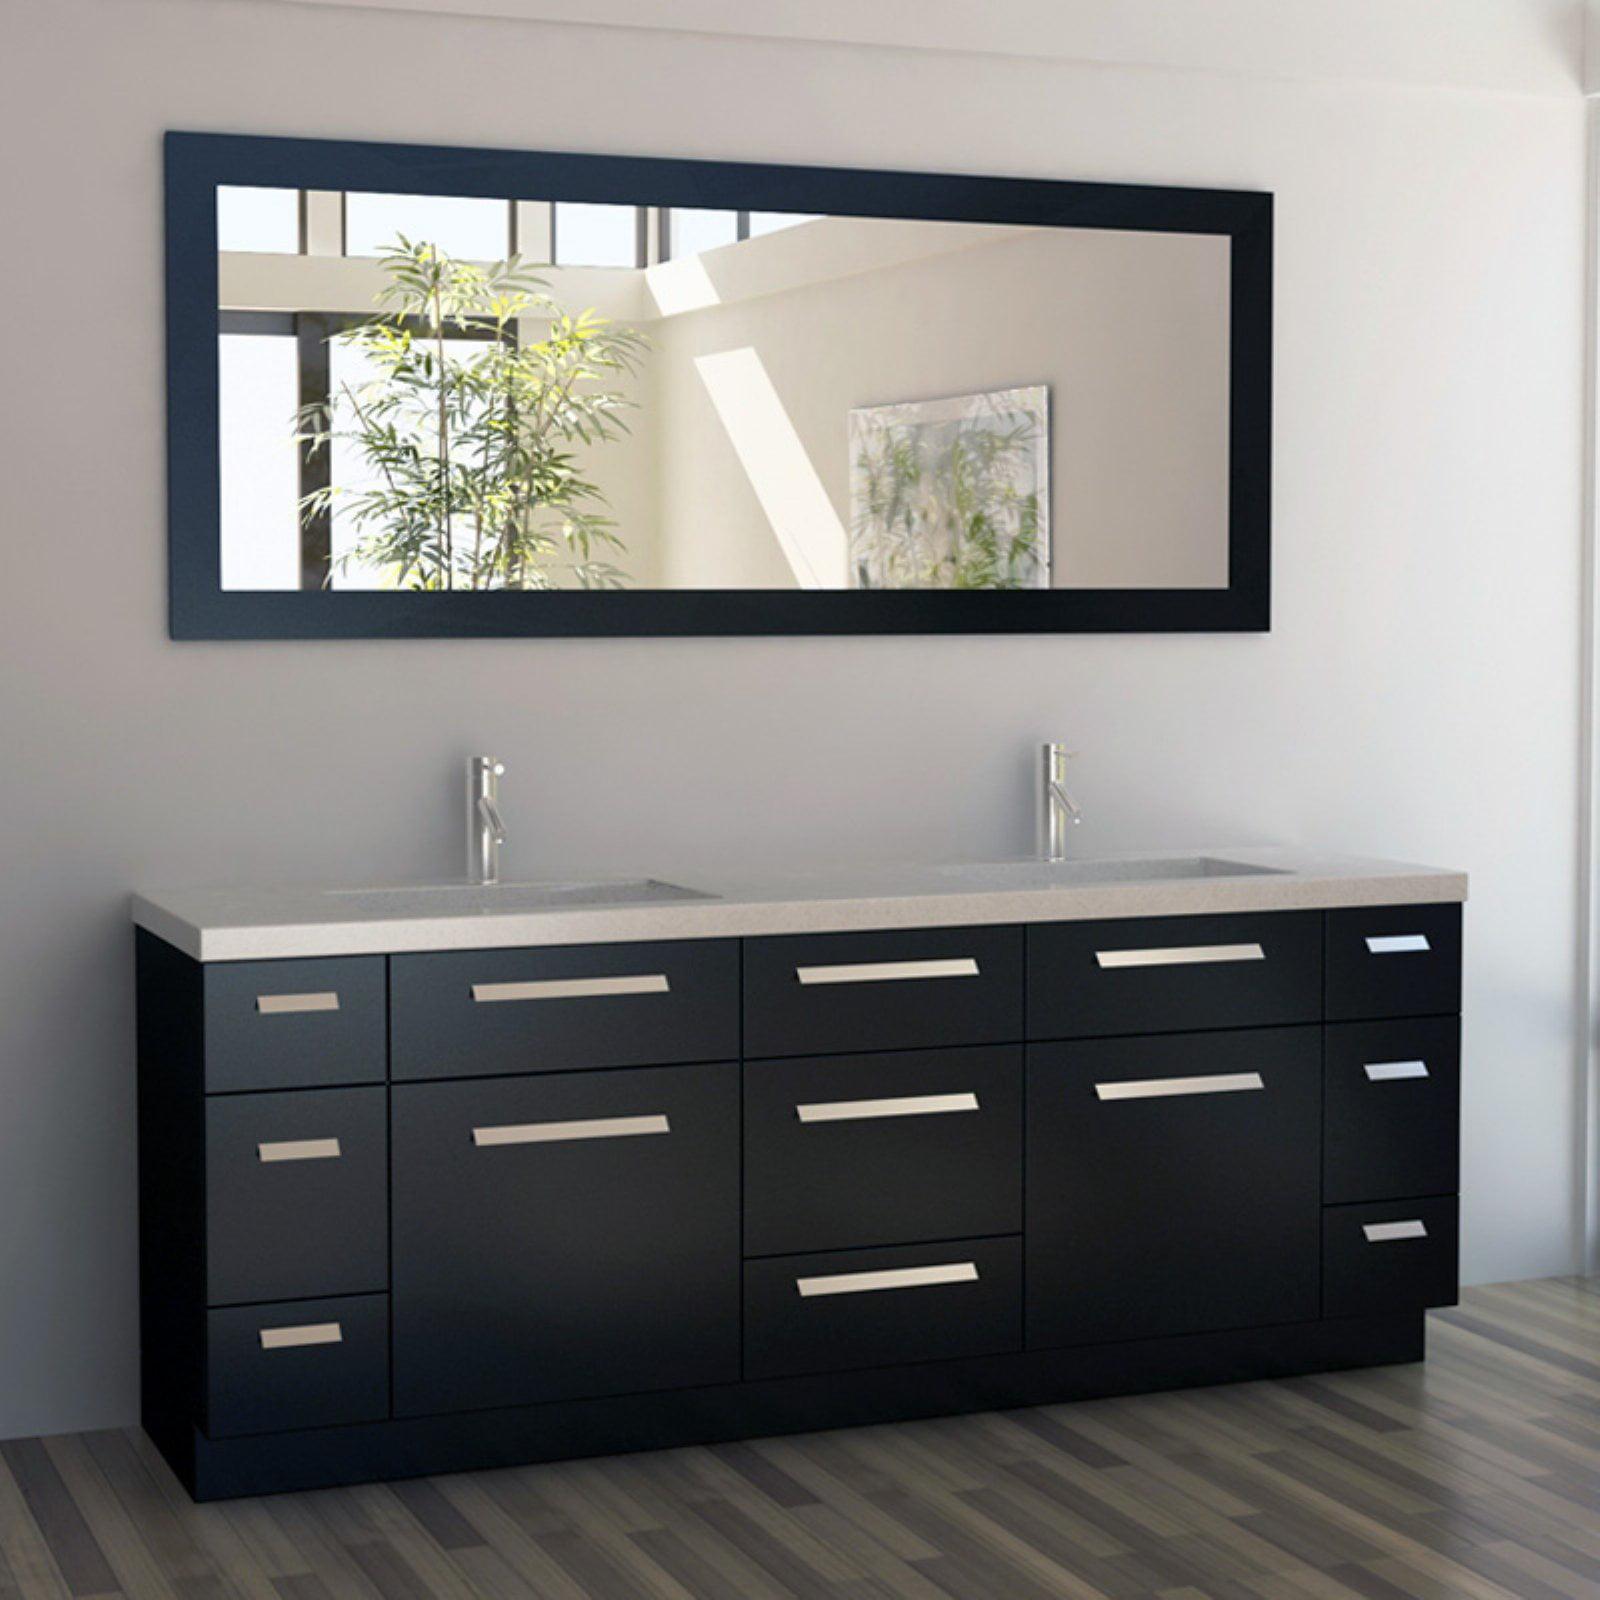 Design Element J84-DS Moscony 84 in. Double Bathroom Vanity Set